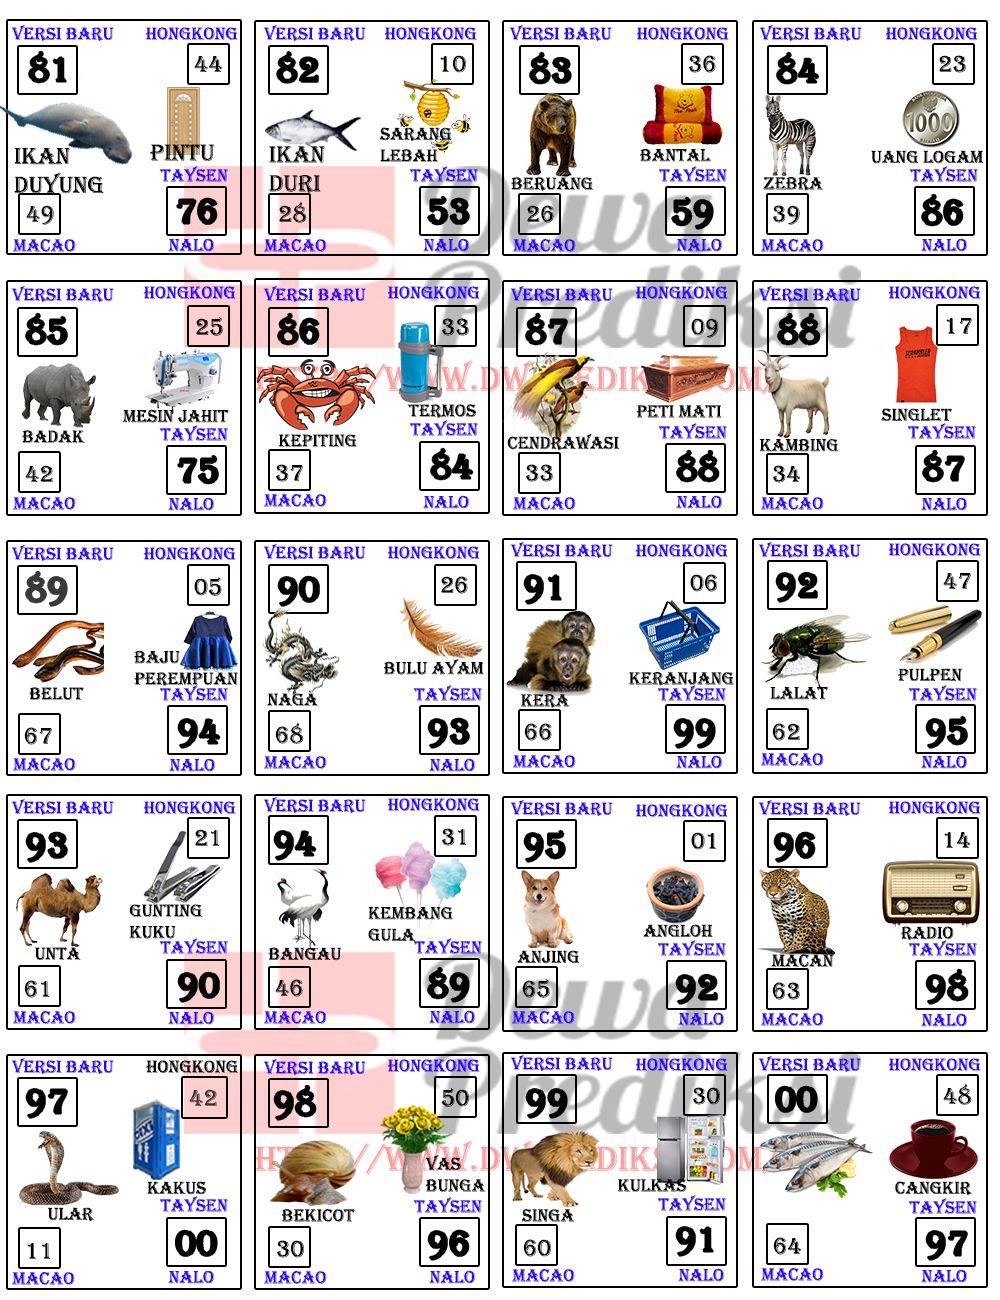 Kelelawar Masuk Rumah Menurut Islam : kelelawar, masuk, rumah, menurut, islam, Mimpi, Kelelawar, Masuk, Rumah, Sampai, Digigit, Cute766